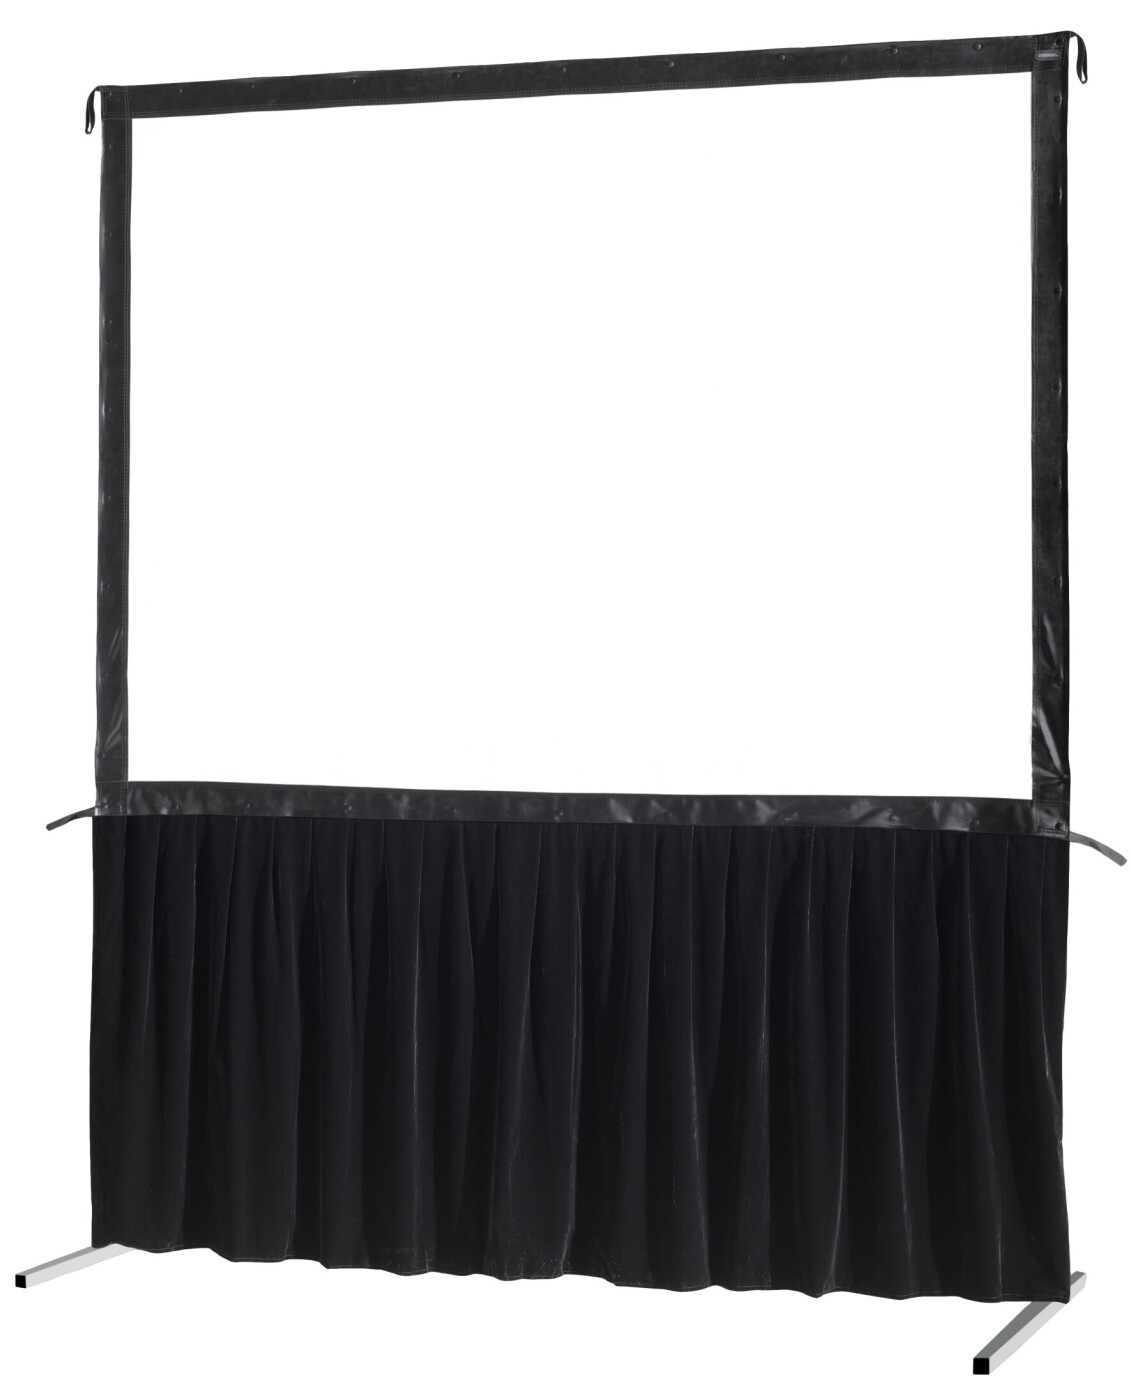 celexon Vorhangset 1-seitig für Faltrahmenleinwand Mobil Expert 305 x 172 cm